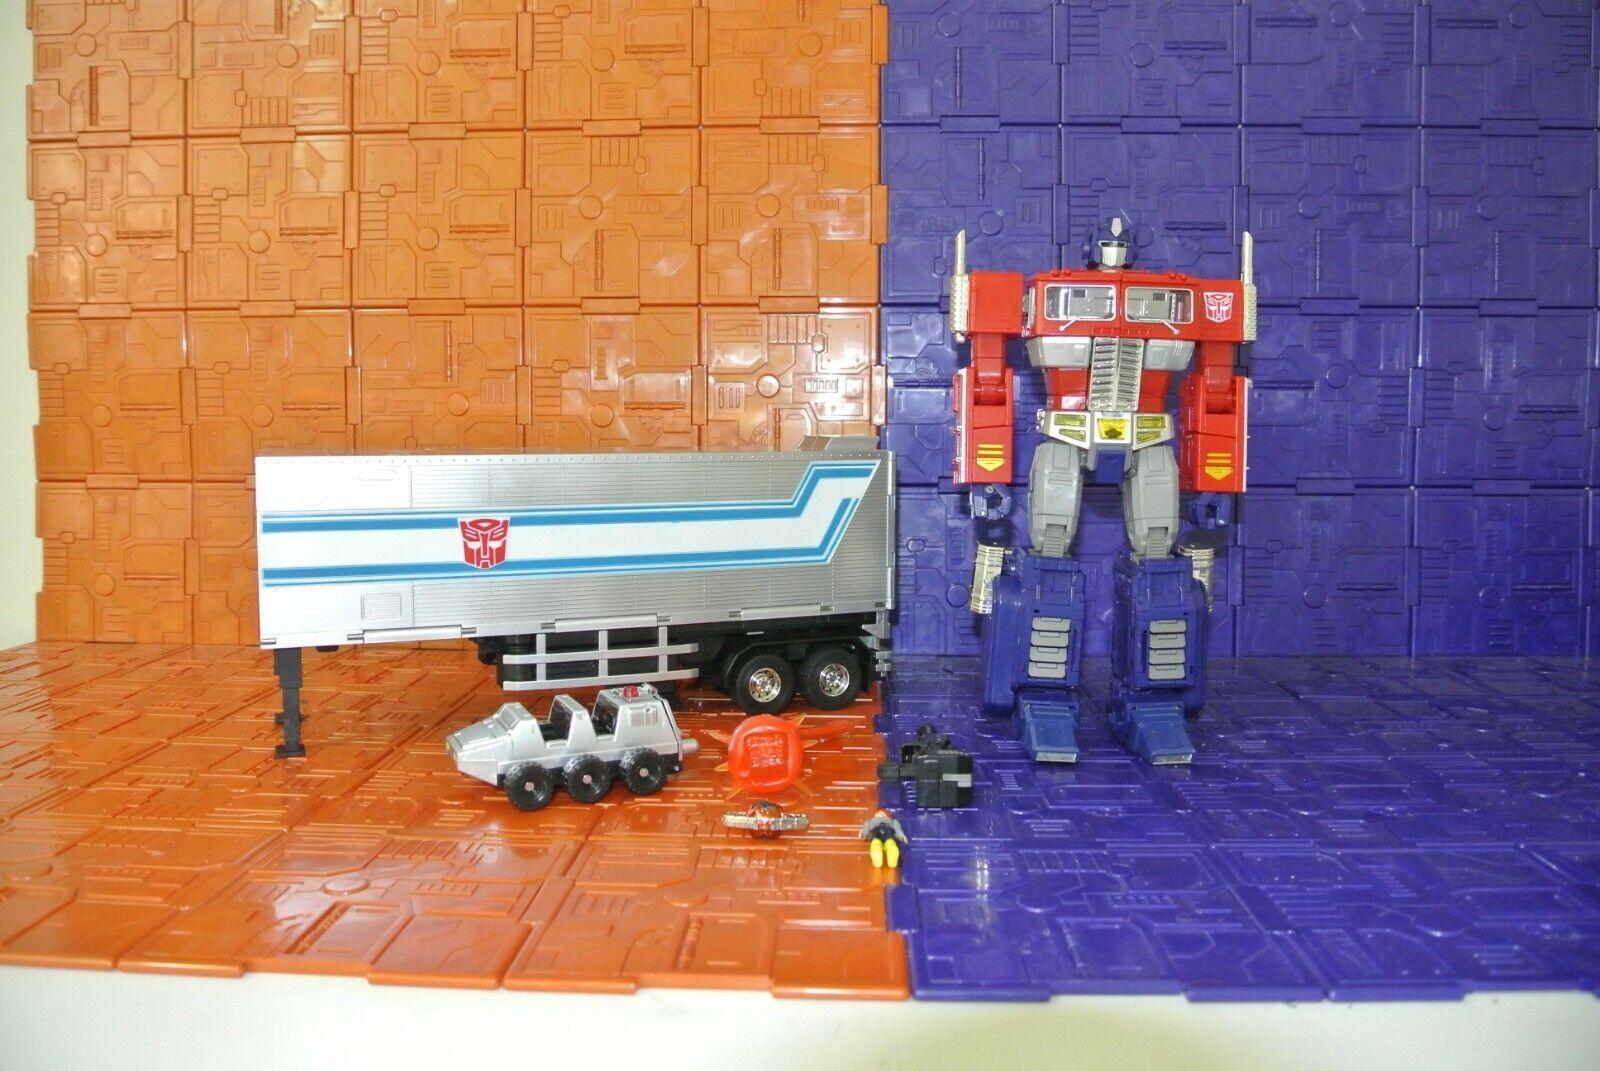 Takara Transformers MP10 Optimus Prime genuine + MP10 trailer KO set package